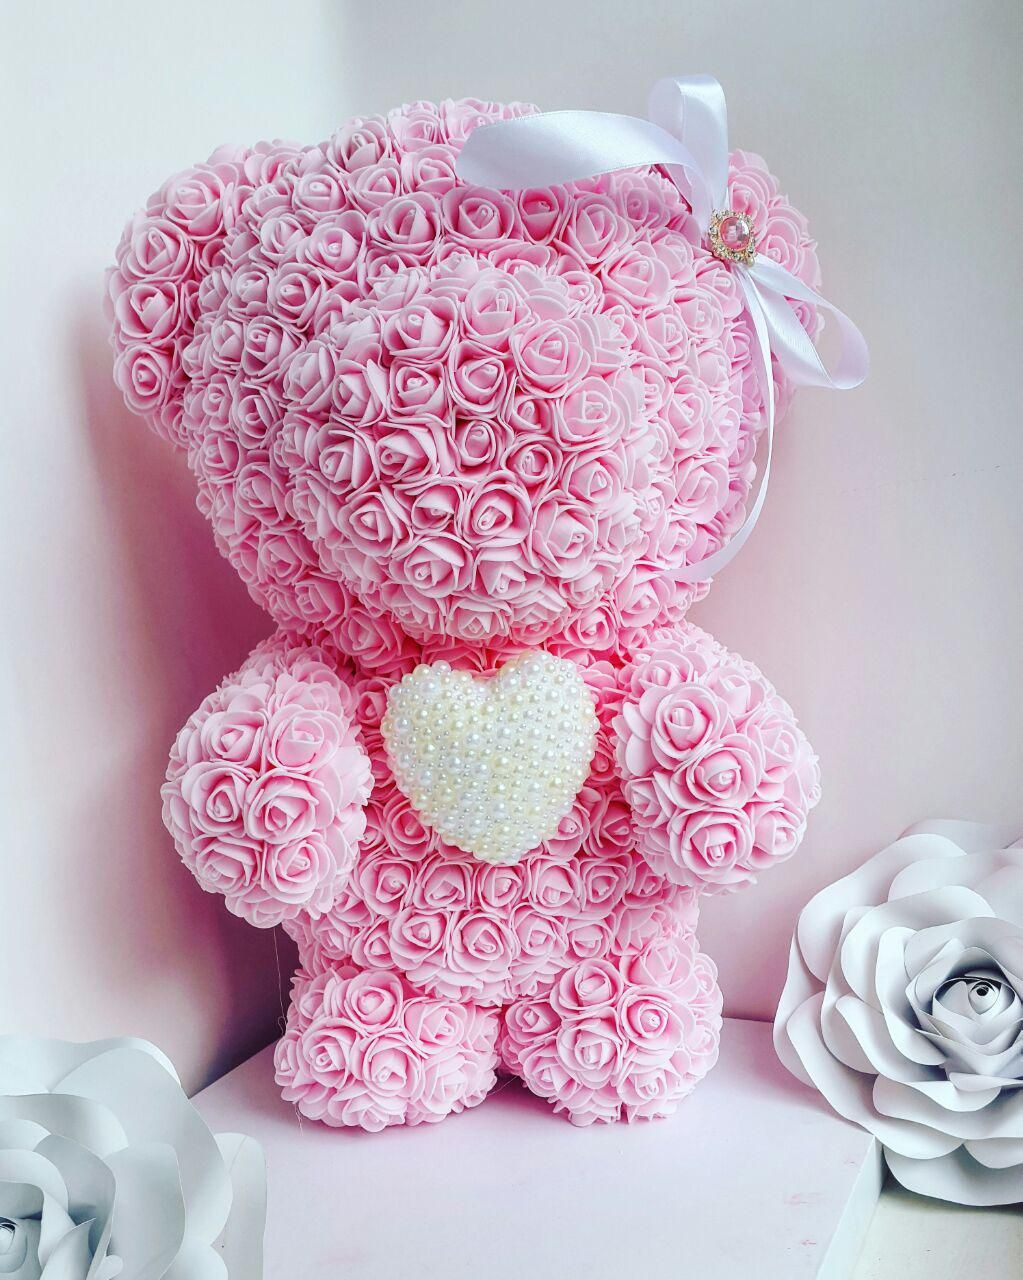 Rose Teddy Bear 17 8 Inch Forever Rose Teddy Bear Wedding Gifts Love Bear Flower Rose Bear Forever Rose Rose Flower Arrangements Flower Crafts